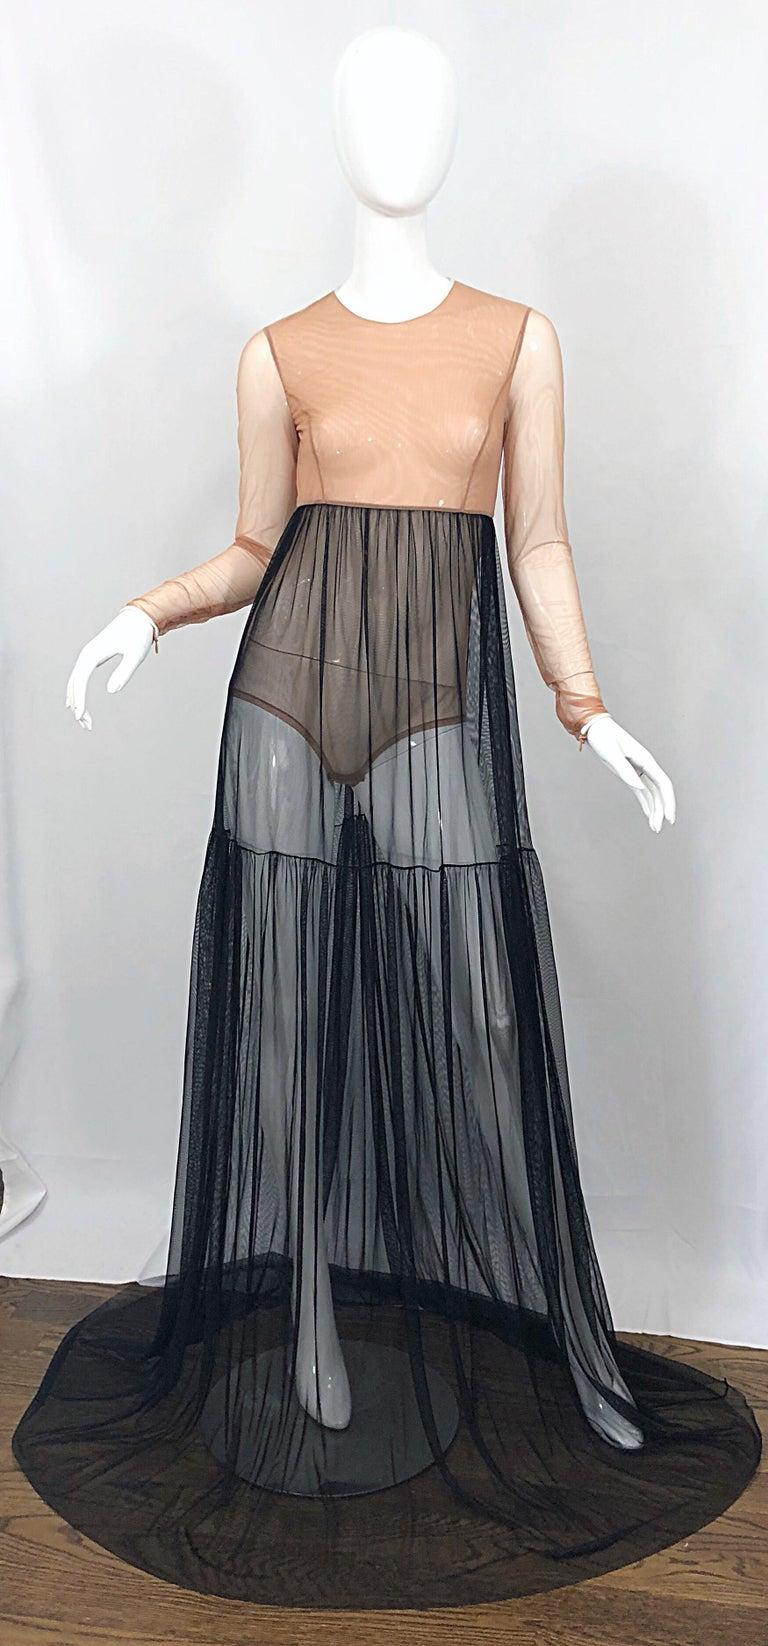 Michael Kors Collection Sz 4 Nude + Black Sheer Runway Mesh Bodysuit Gown Dress For Sale 9